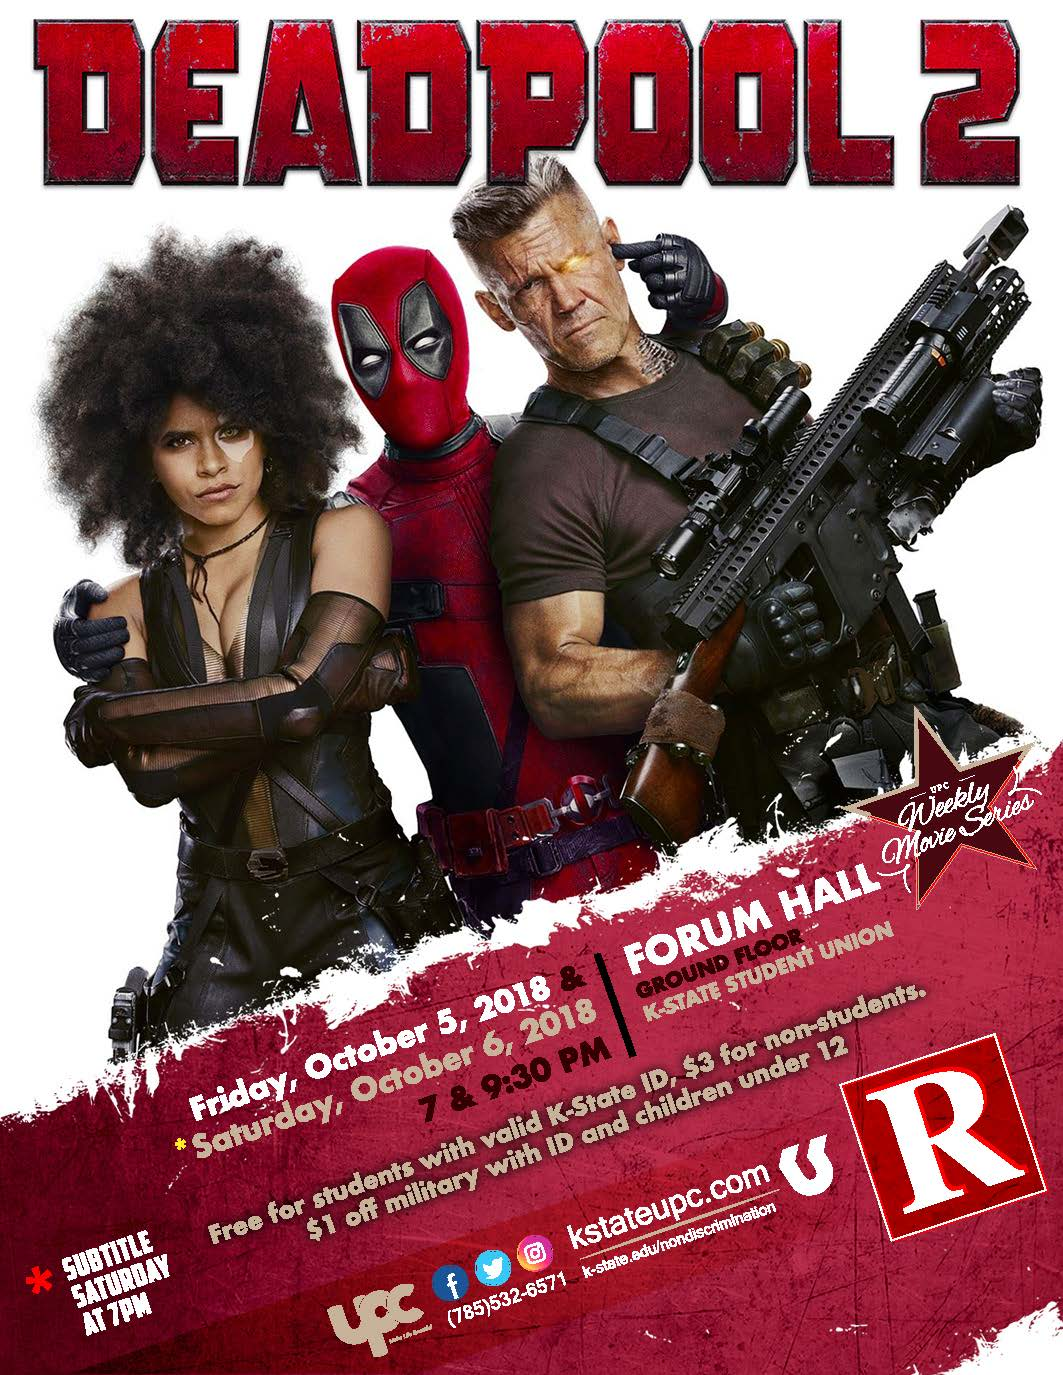 Deadpool 2 Subtitle : deadpool, subtitle, Film:, Deadpool, K-State, Student, Union, Program, Council